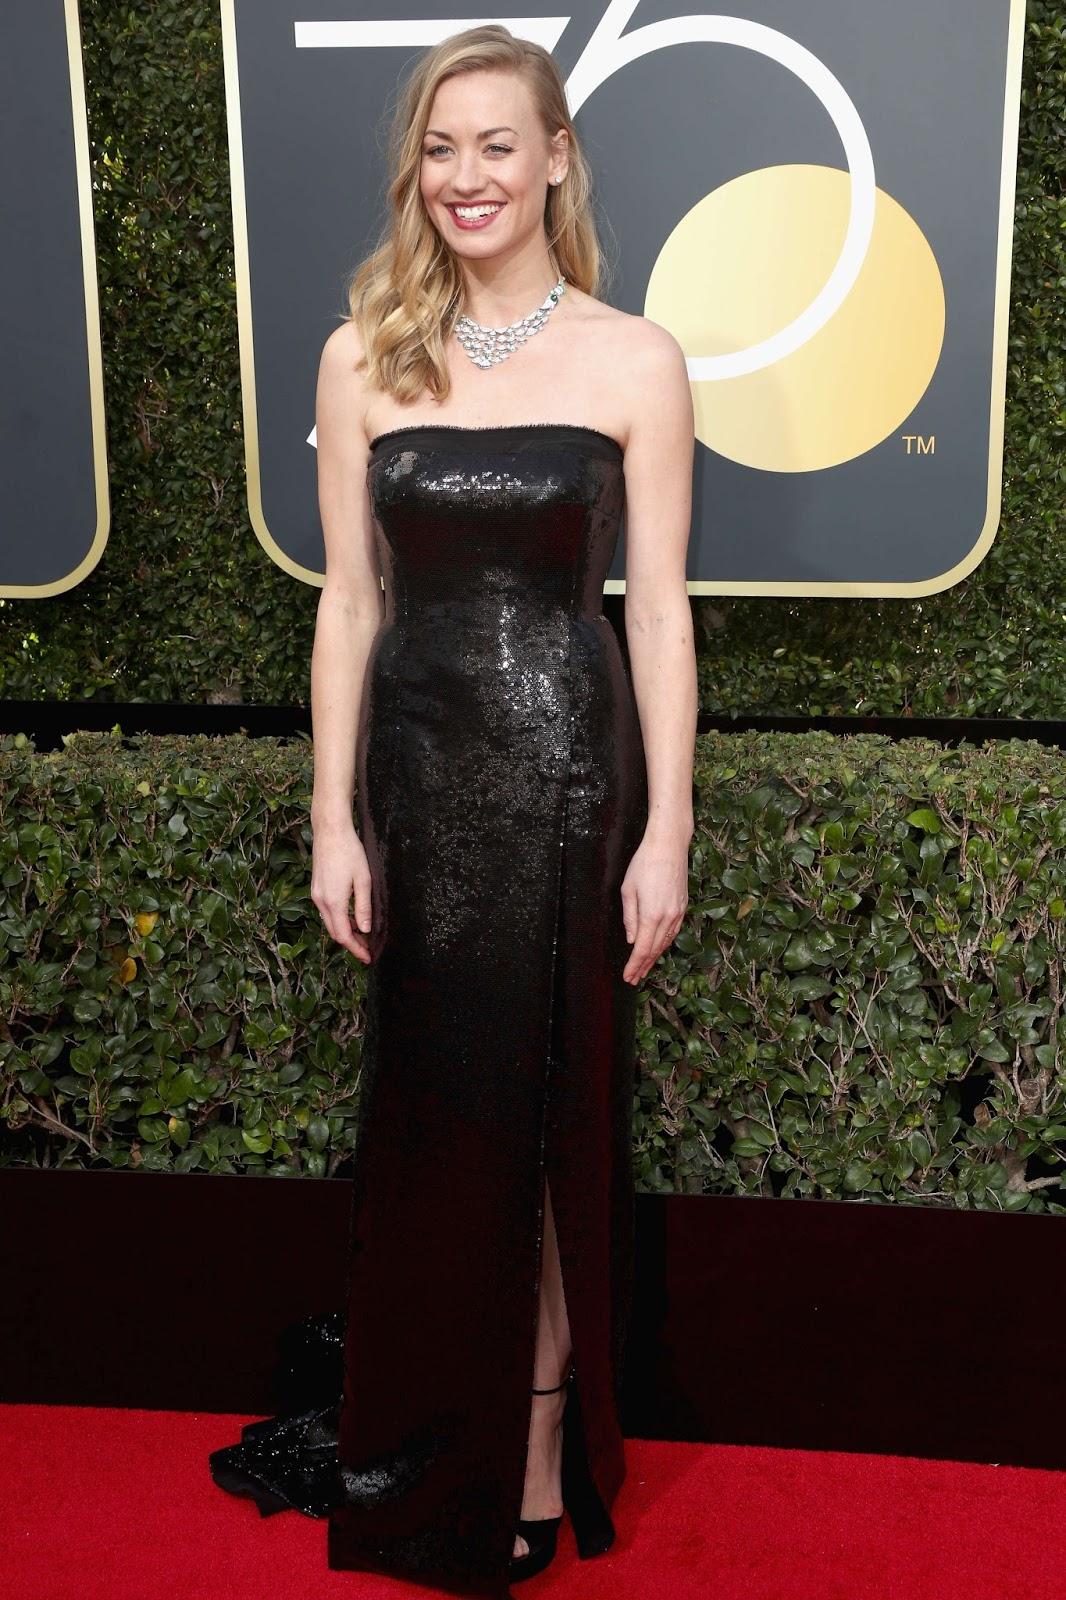 Yvonne Strahovski on the Red Carpet at Golden Globe Awards